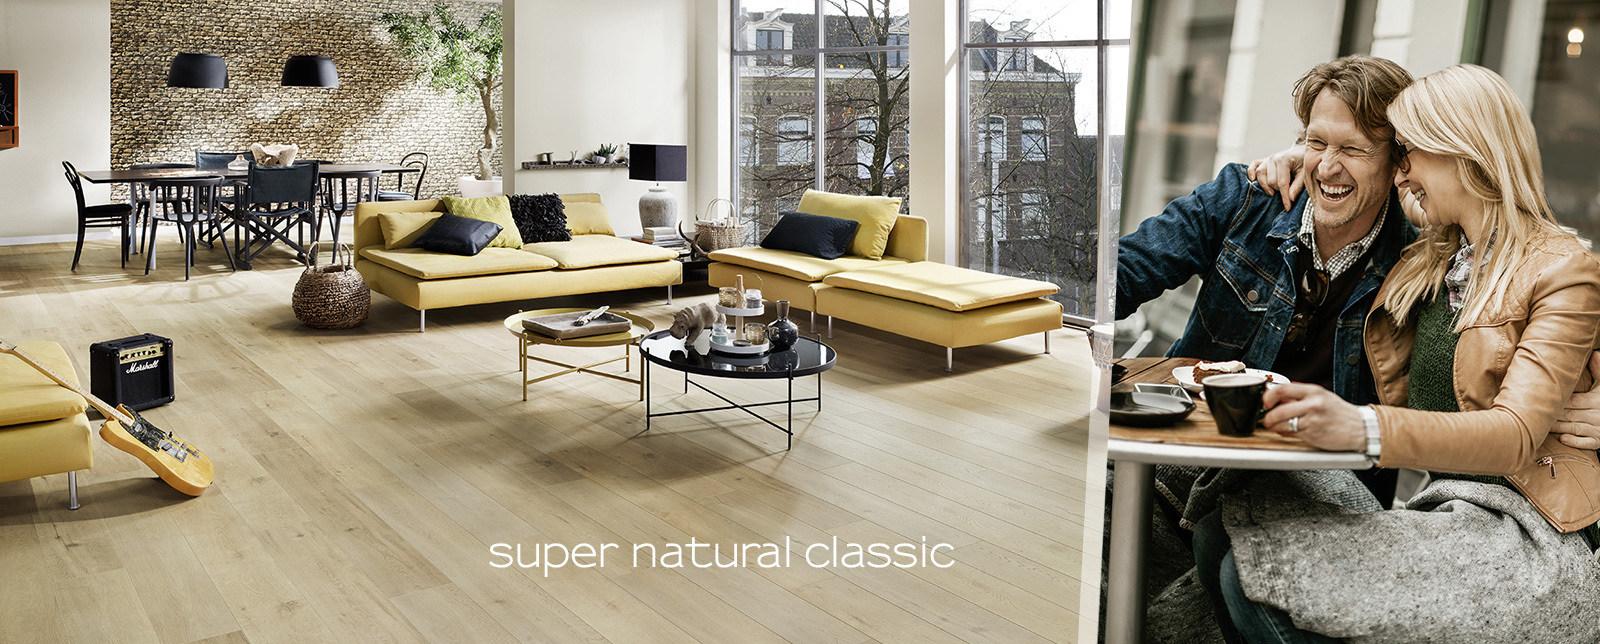 Sàn gỗ Krono Original